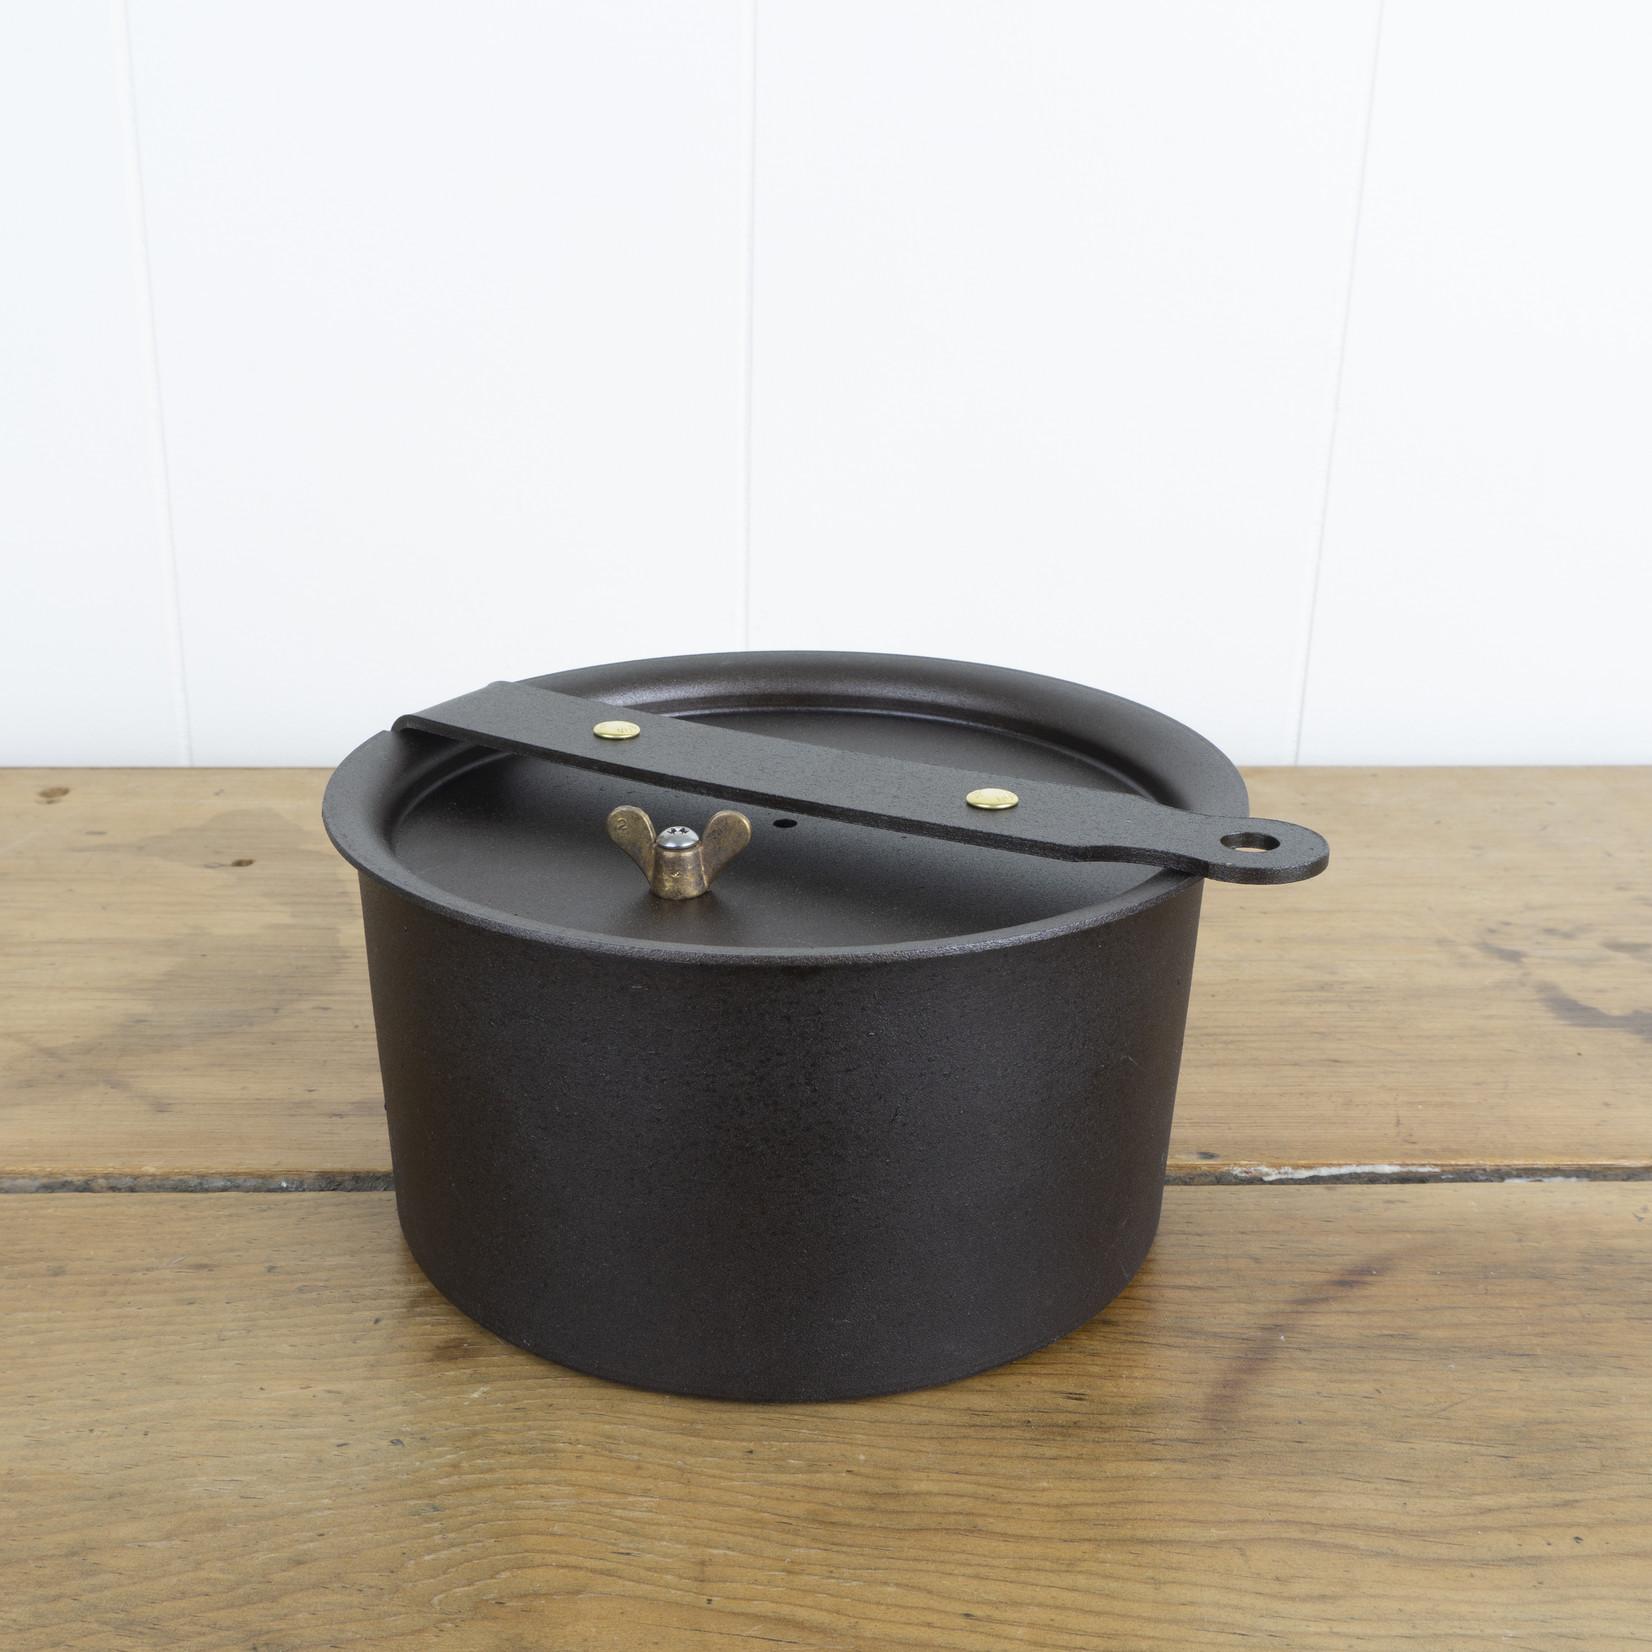 Hand-spun Iron Glamping Pot with lid